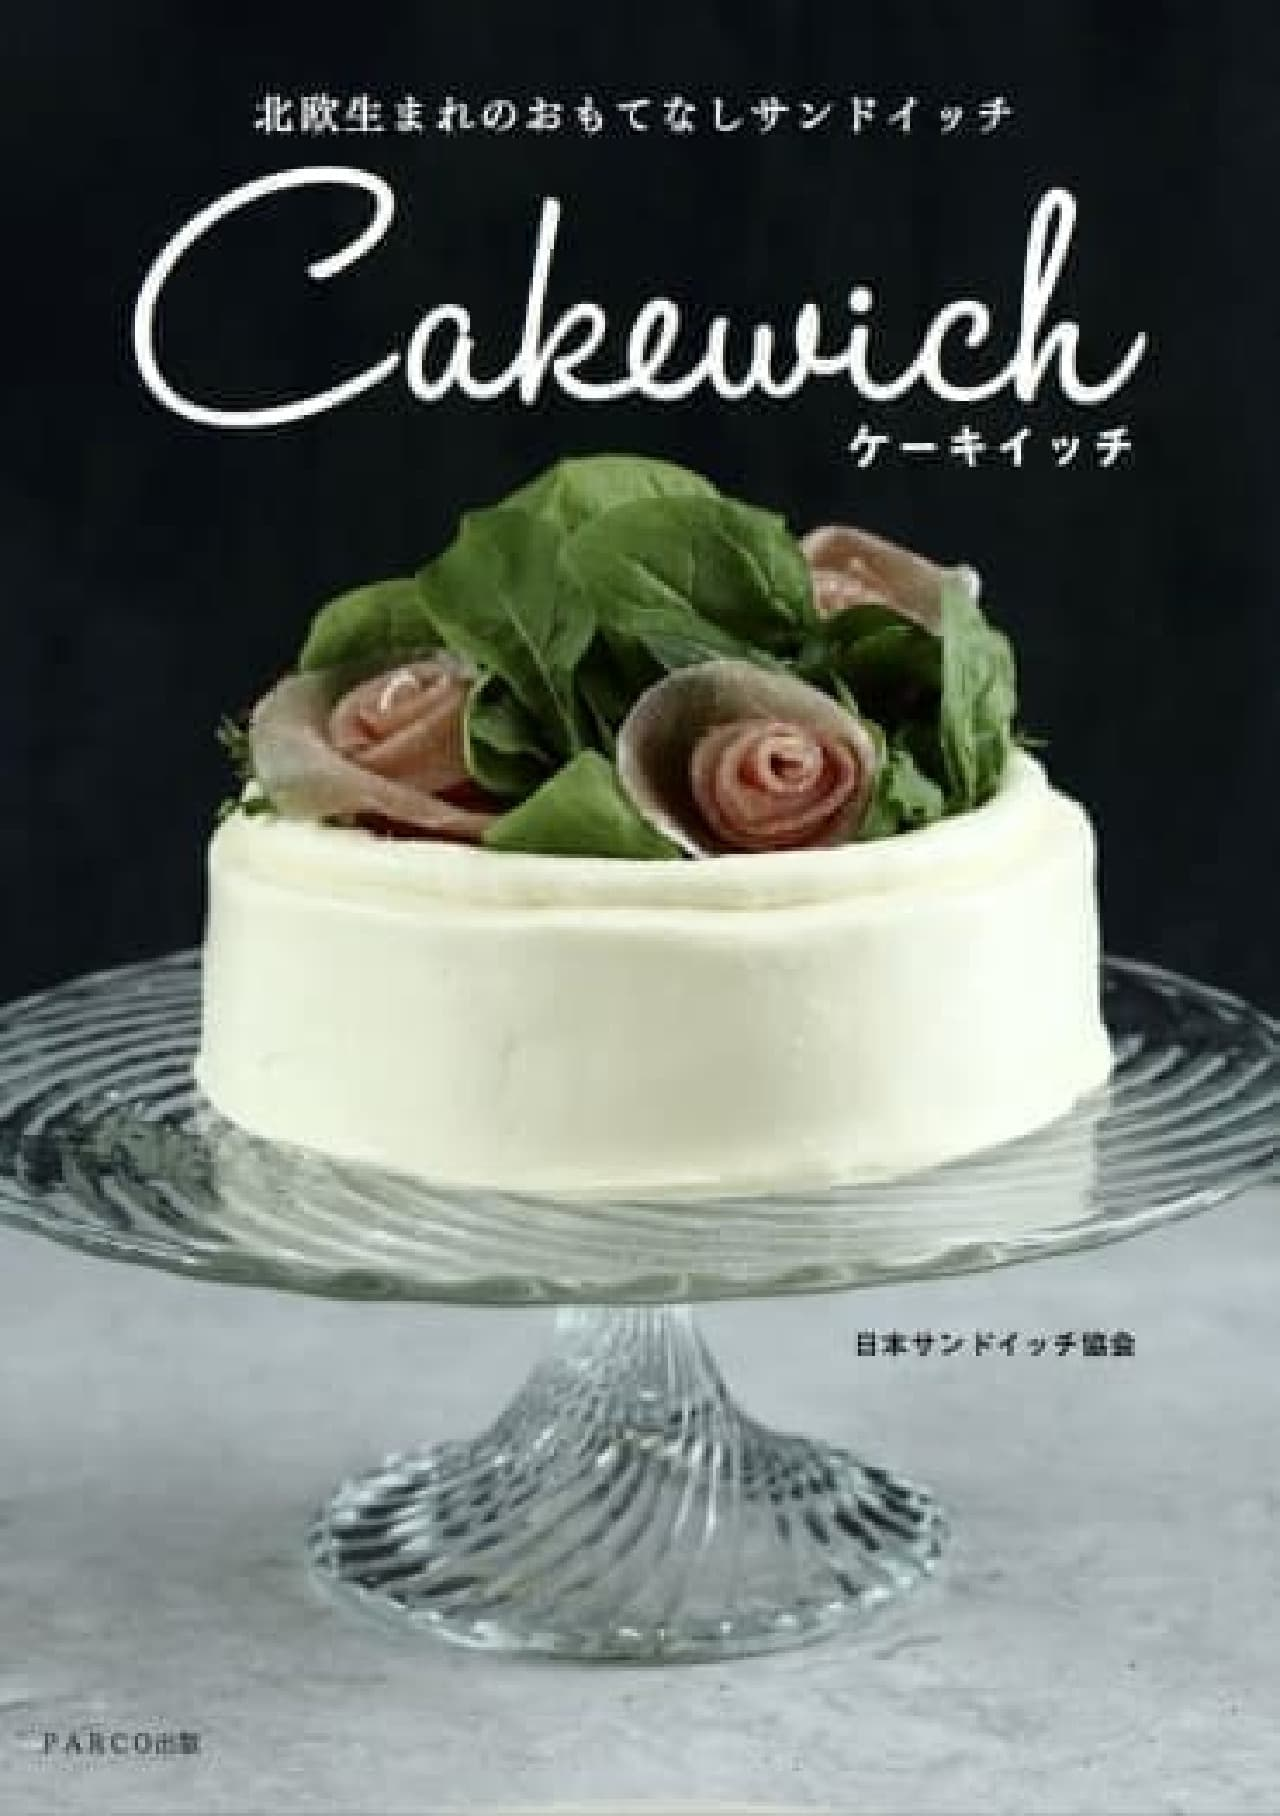 PARCO出版「北欧生まれのおもてなしサンドイッチ『Cakewich』ケーキイッチ」